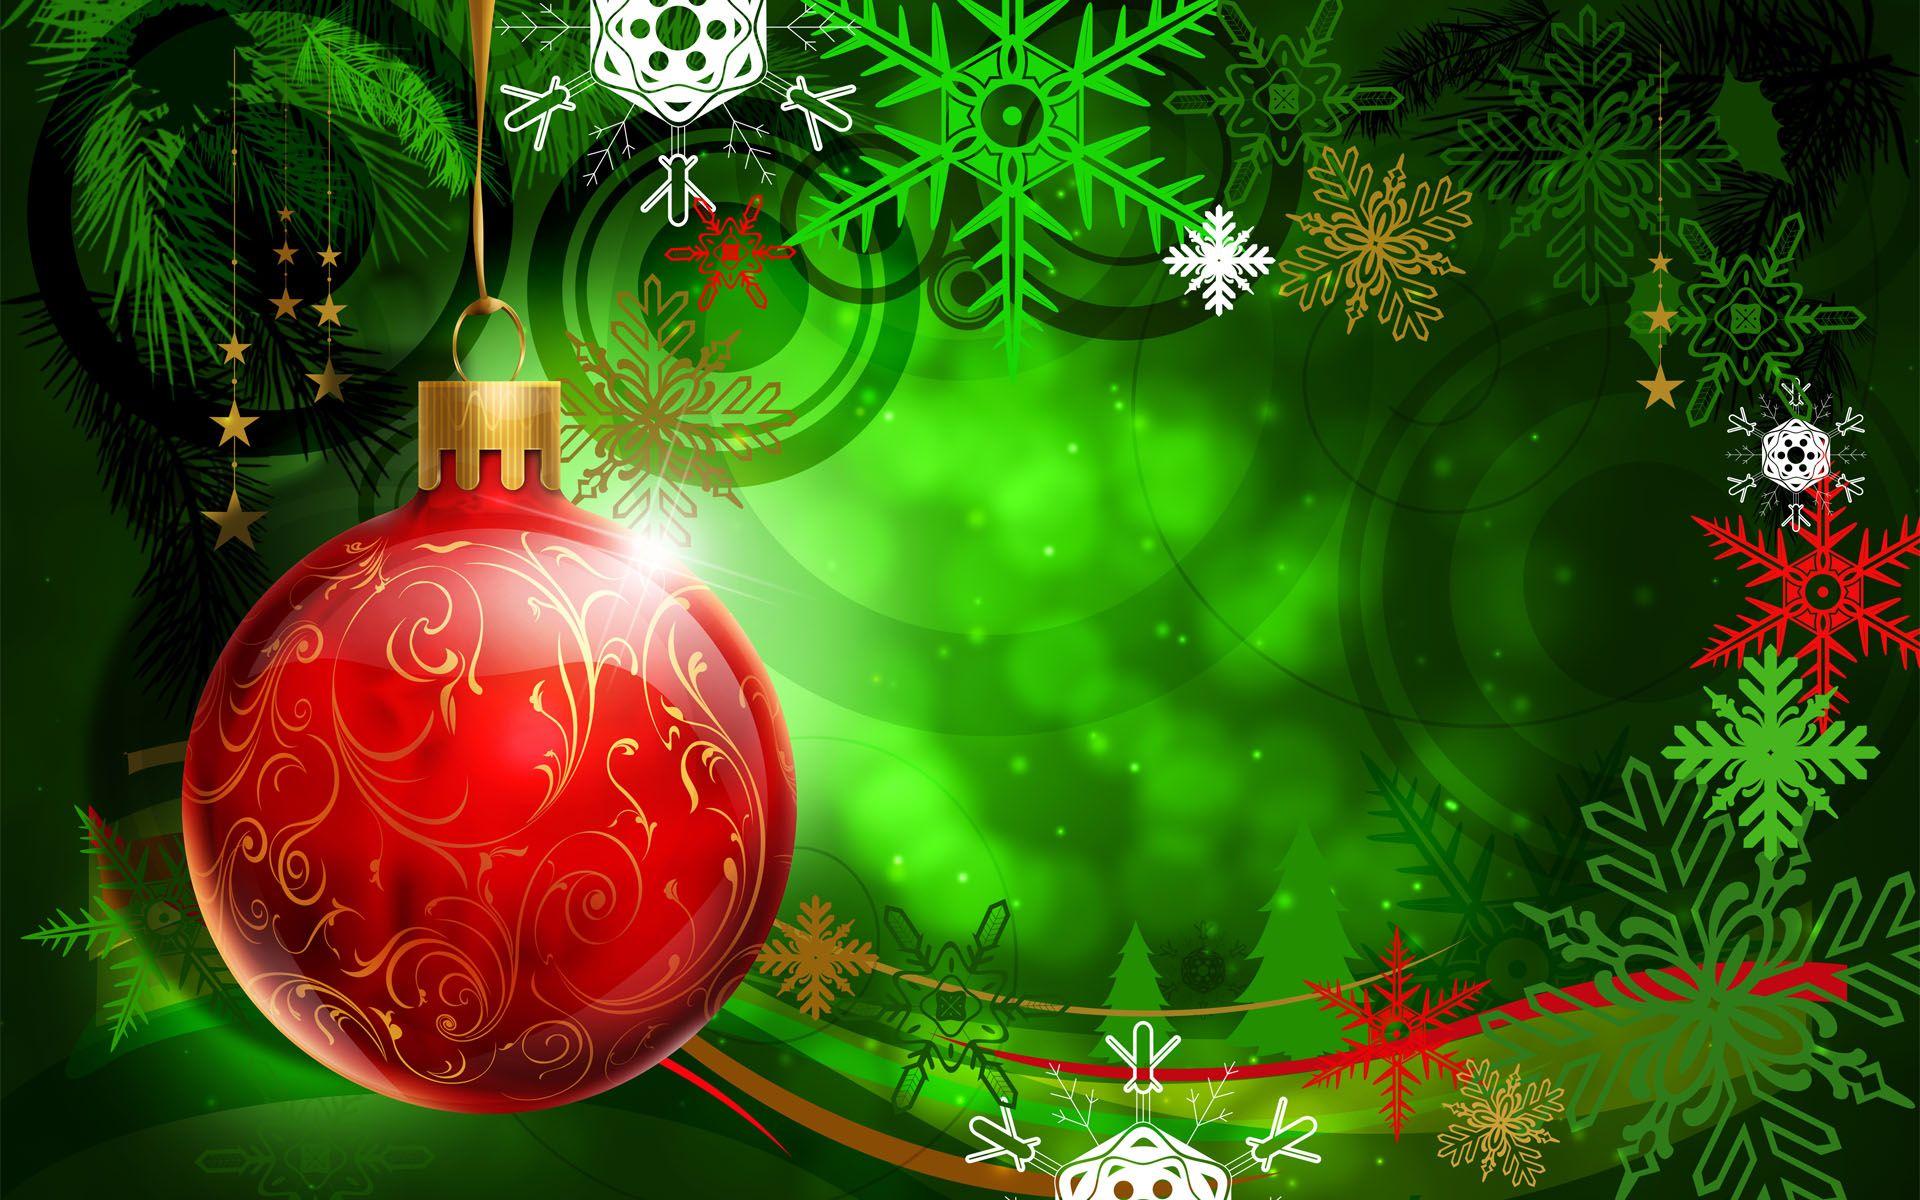 Christmas Wallpaper for Desktop Christmas New Year